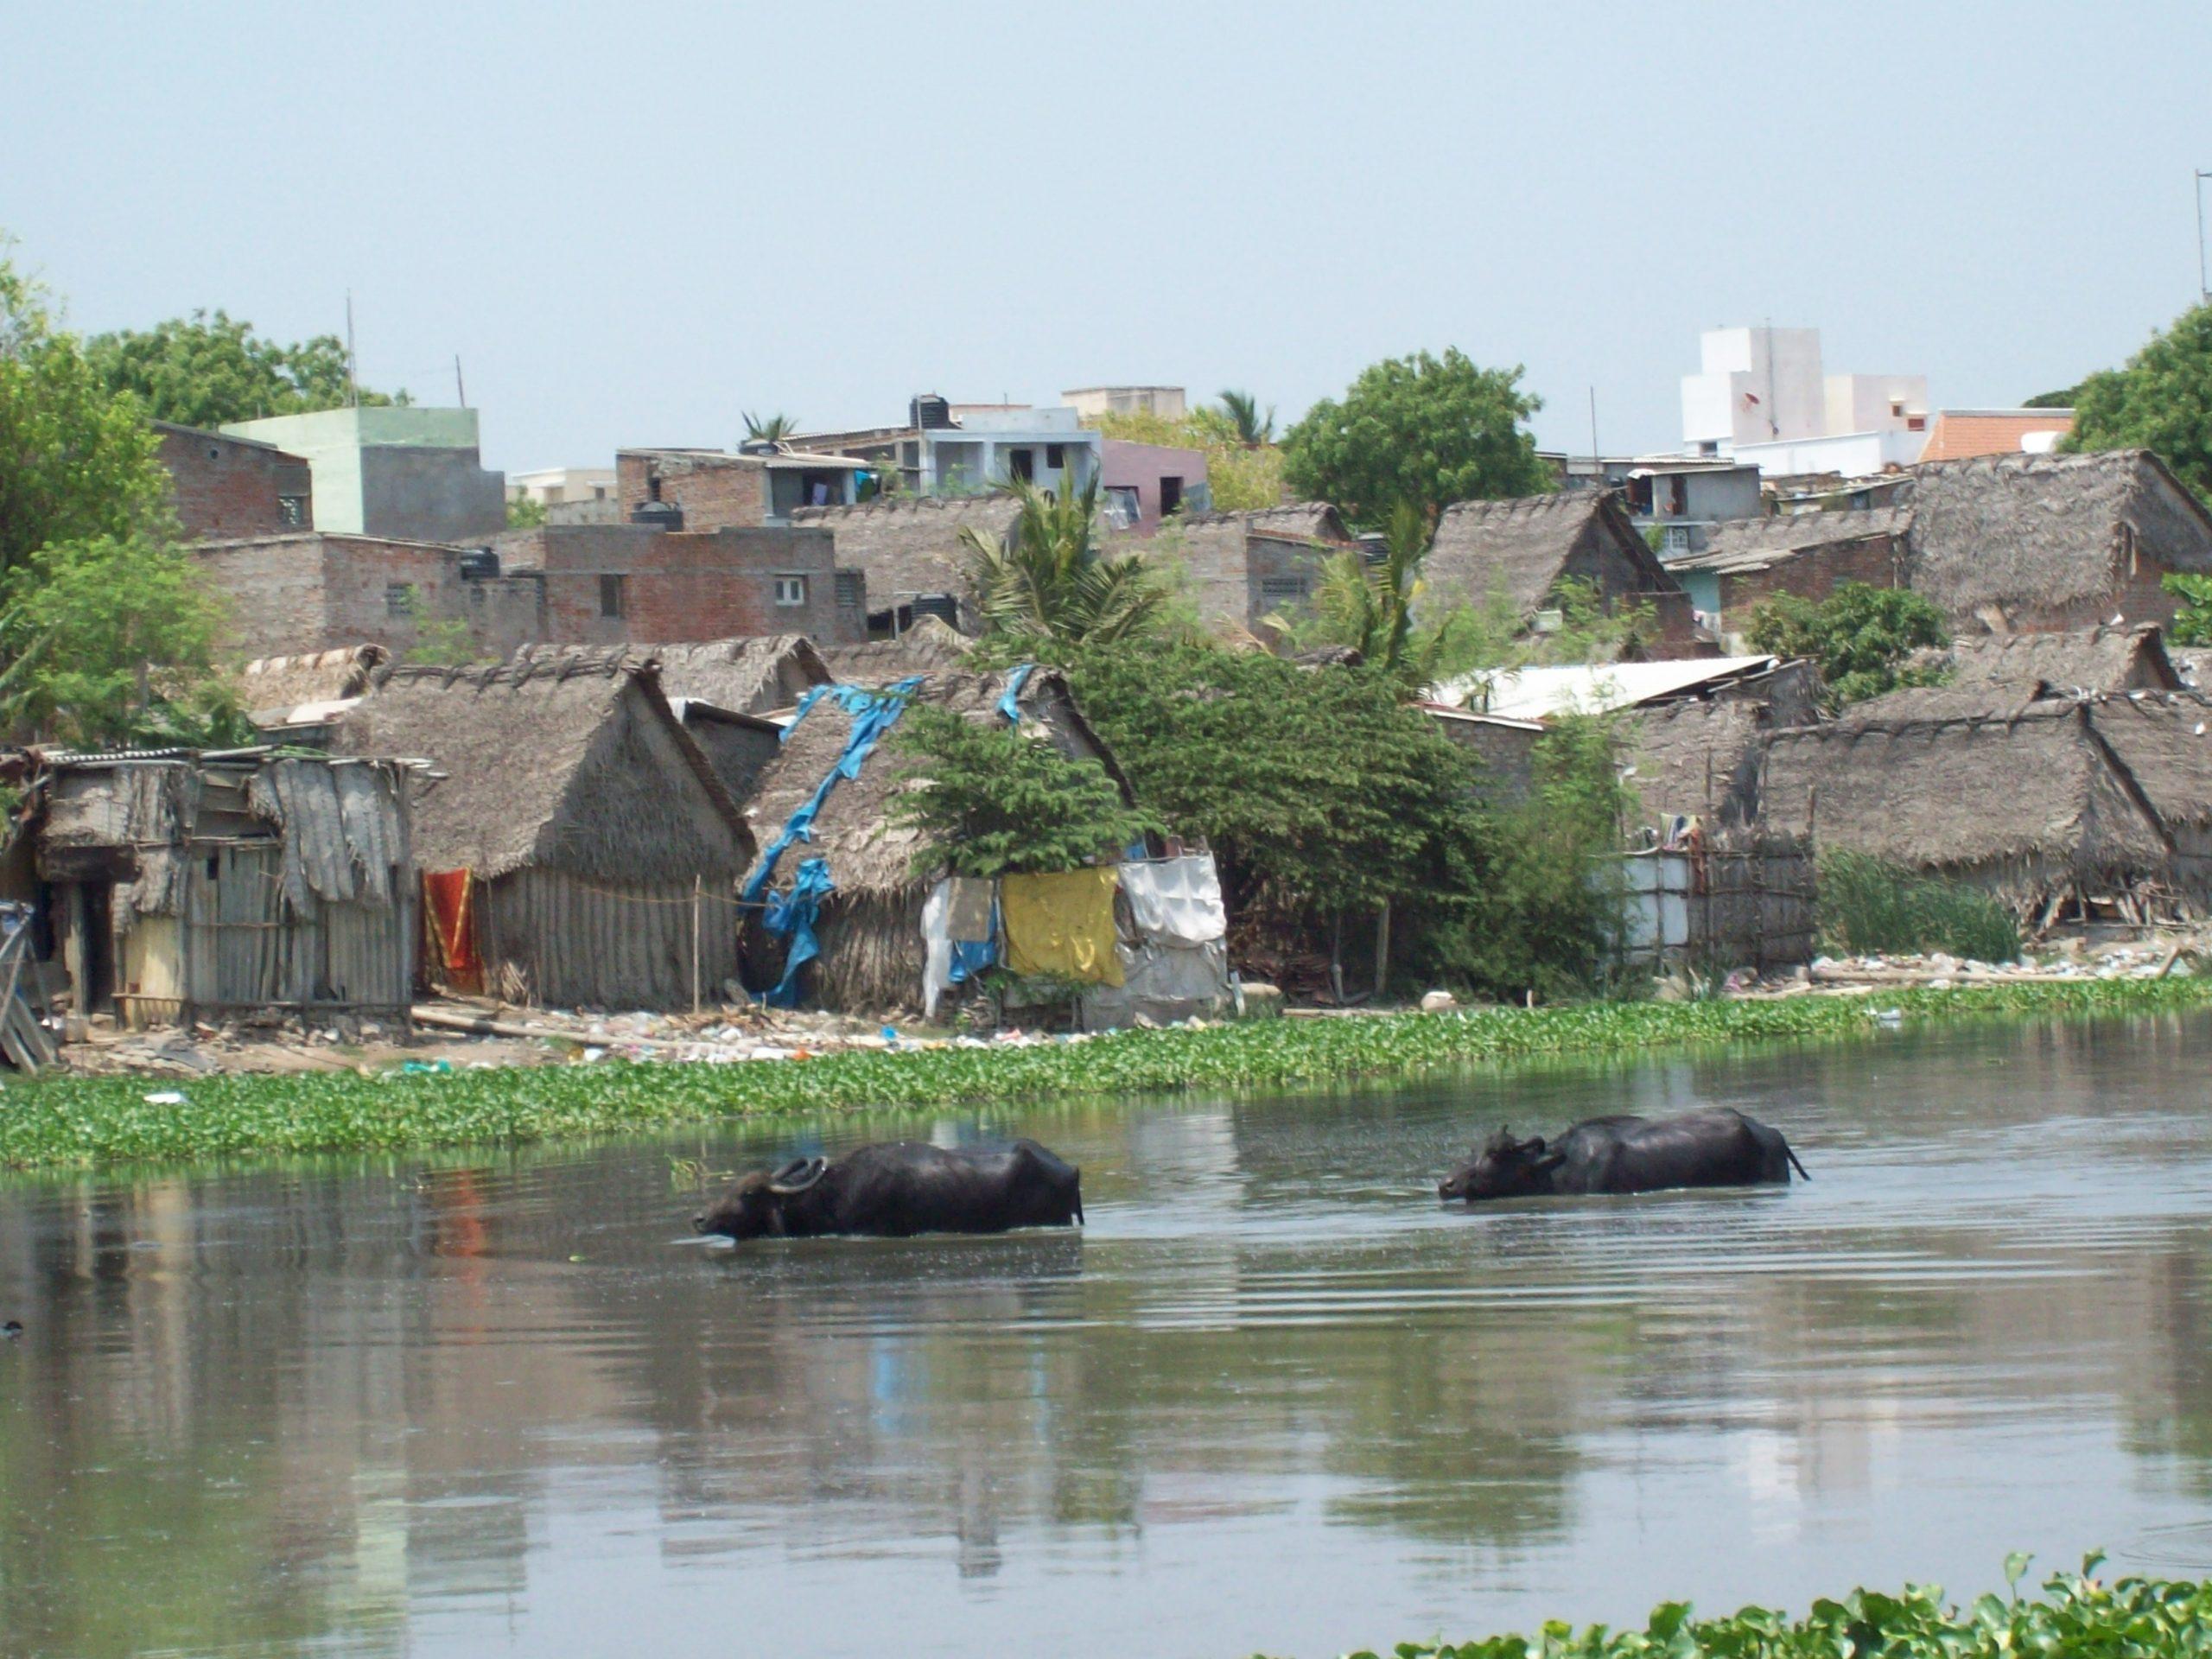 Wild water buffalo in Cooum River, India. Photo courtesy of SARA.